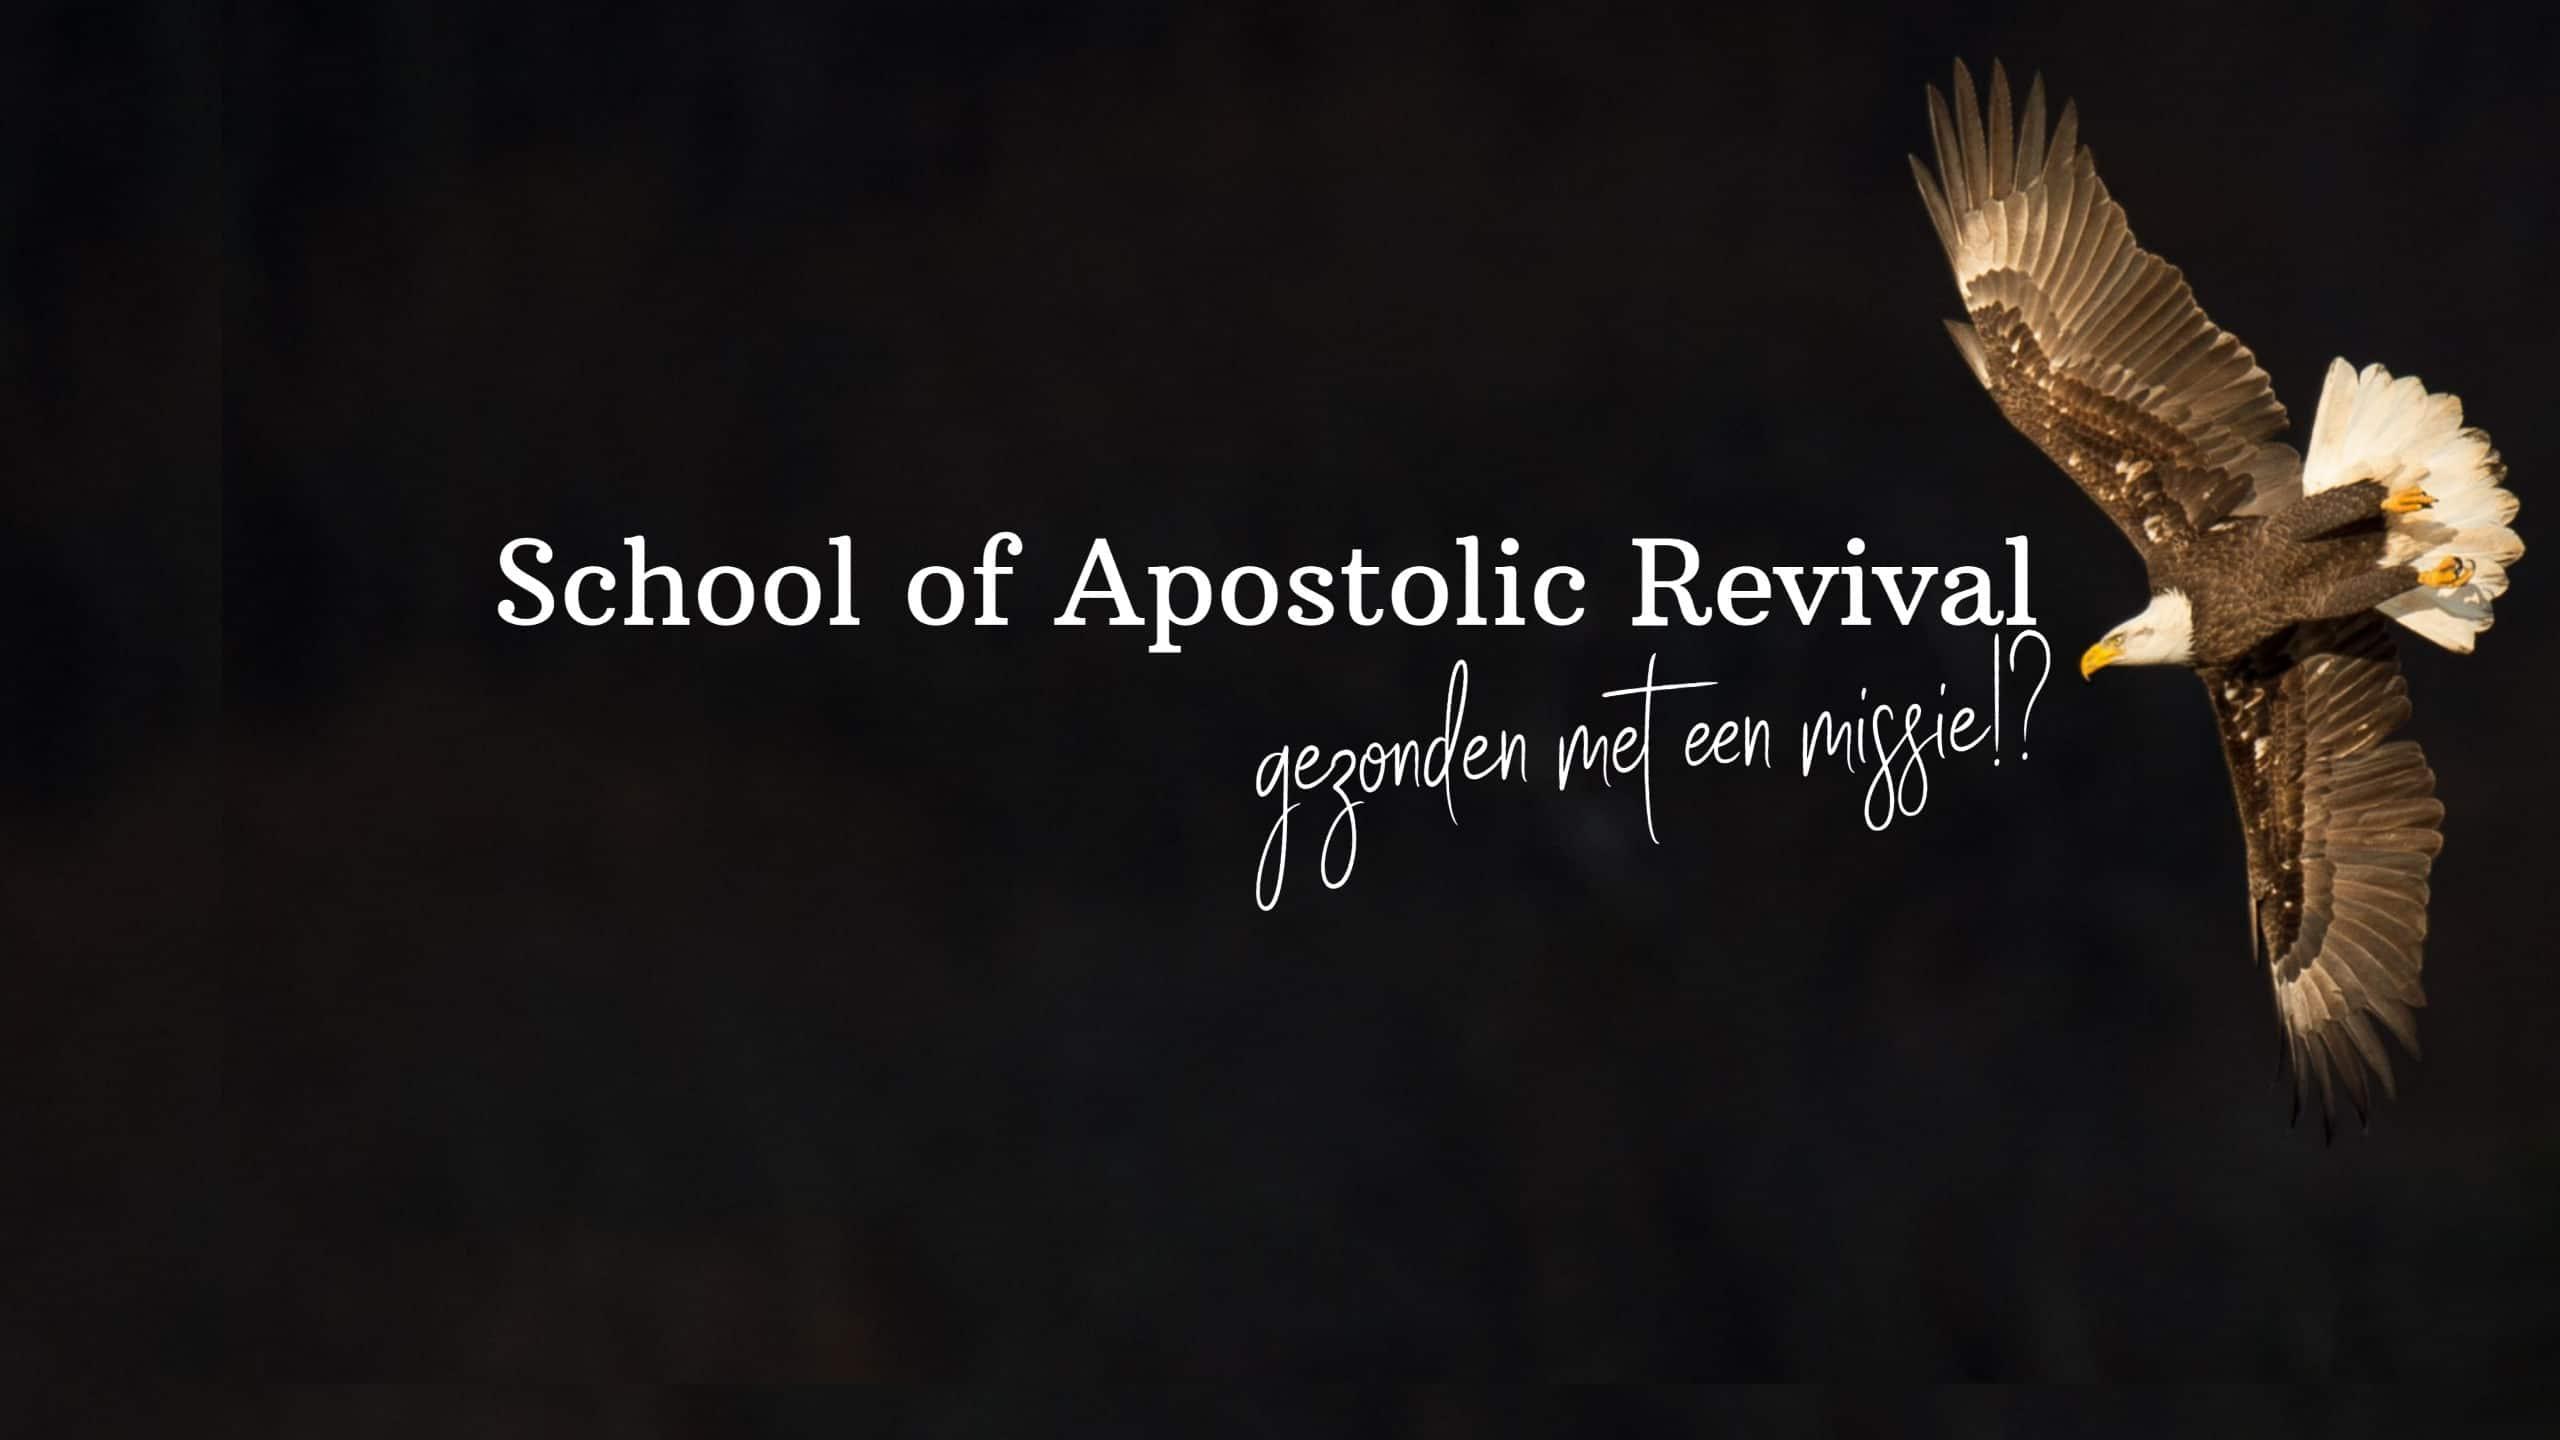 School of Apostolic Revival